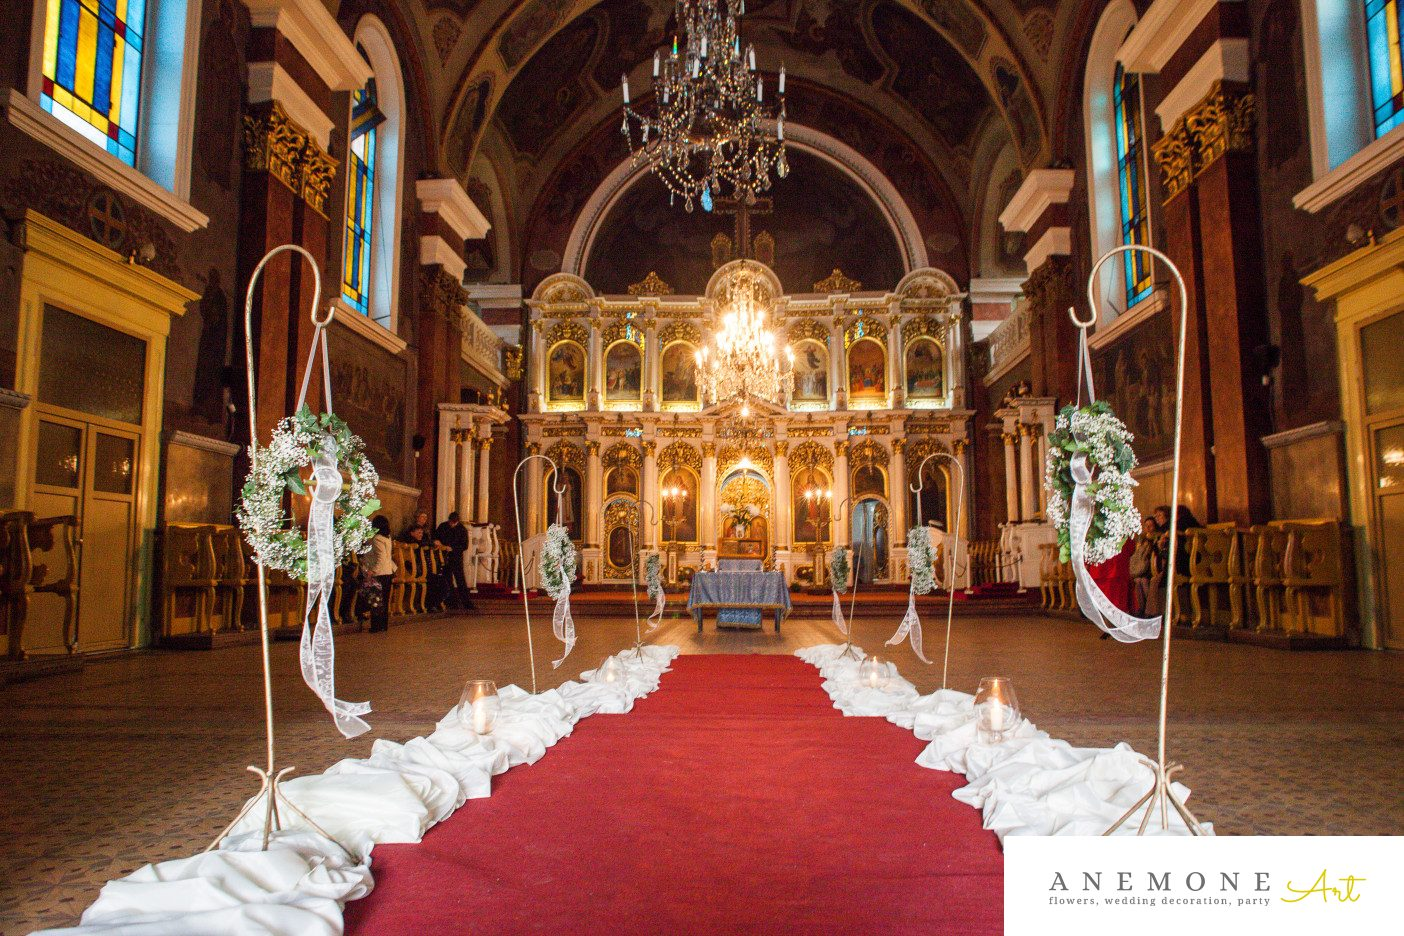 Poza, foto cu Flori de nunta alb, coronita, decor biserica, gipsofila in Arad, Timisoara, Oradea (wedding flowers, bouquets) nunta Arad, Timisoara, Oradea